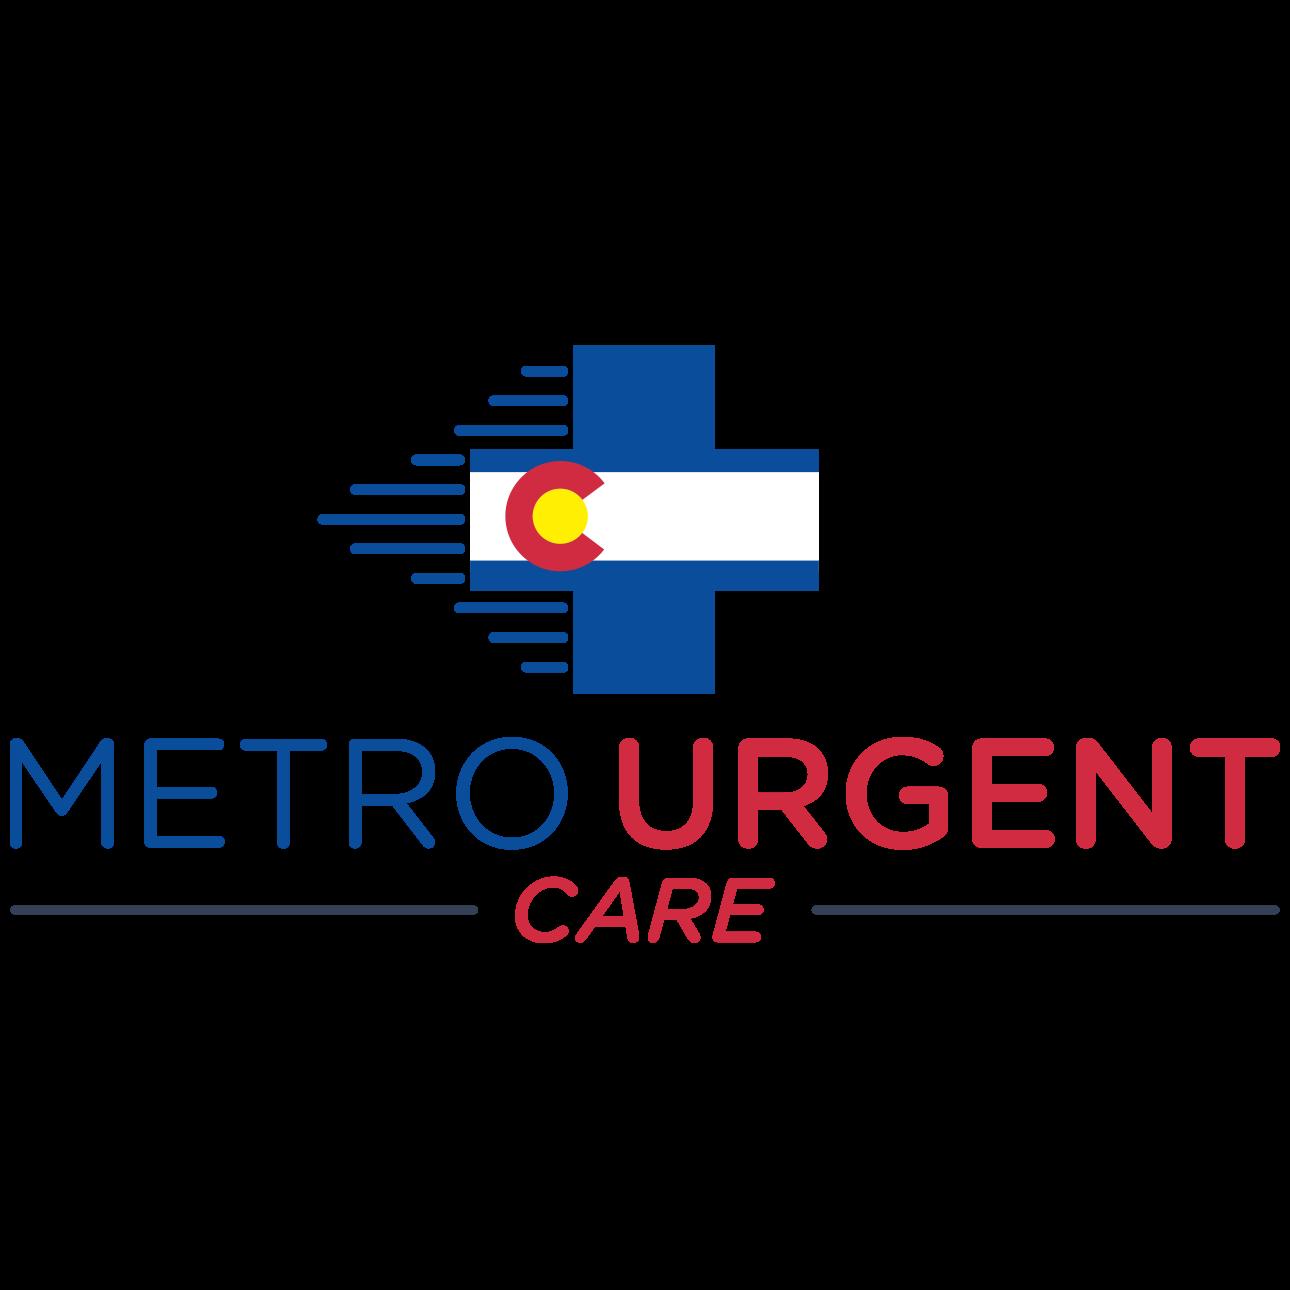 Metro Urgent Care - Havana Safeway Logo